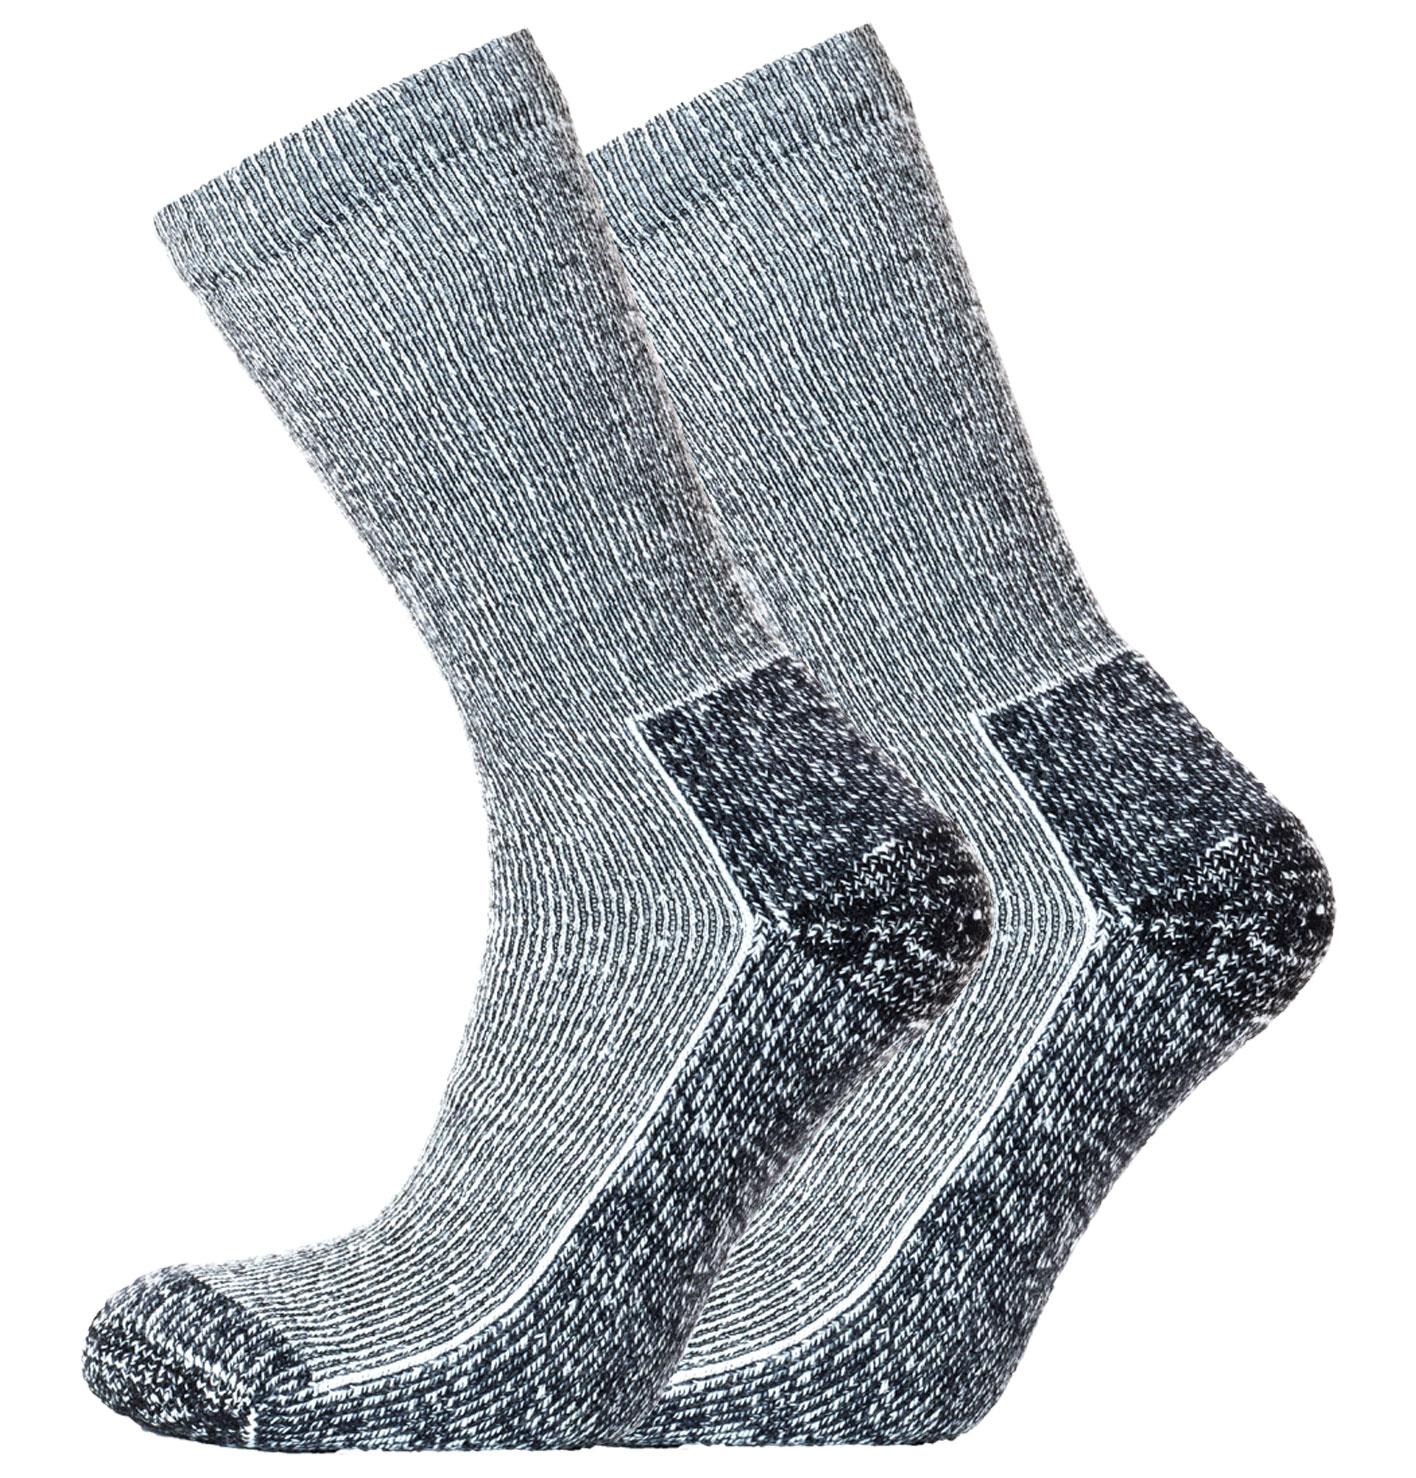 Heritage Coolmax Outdoor 2pk Socks Black Marl